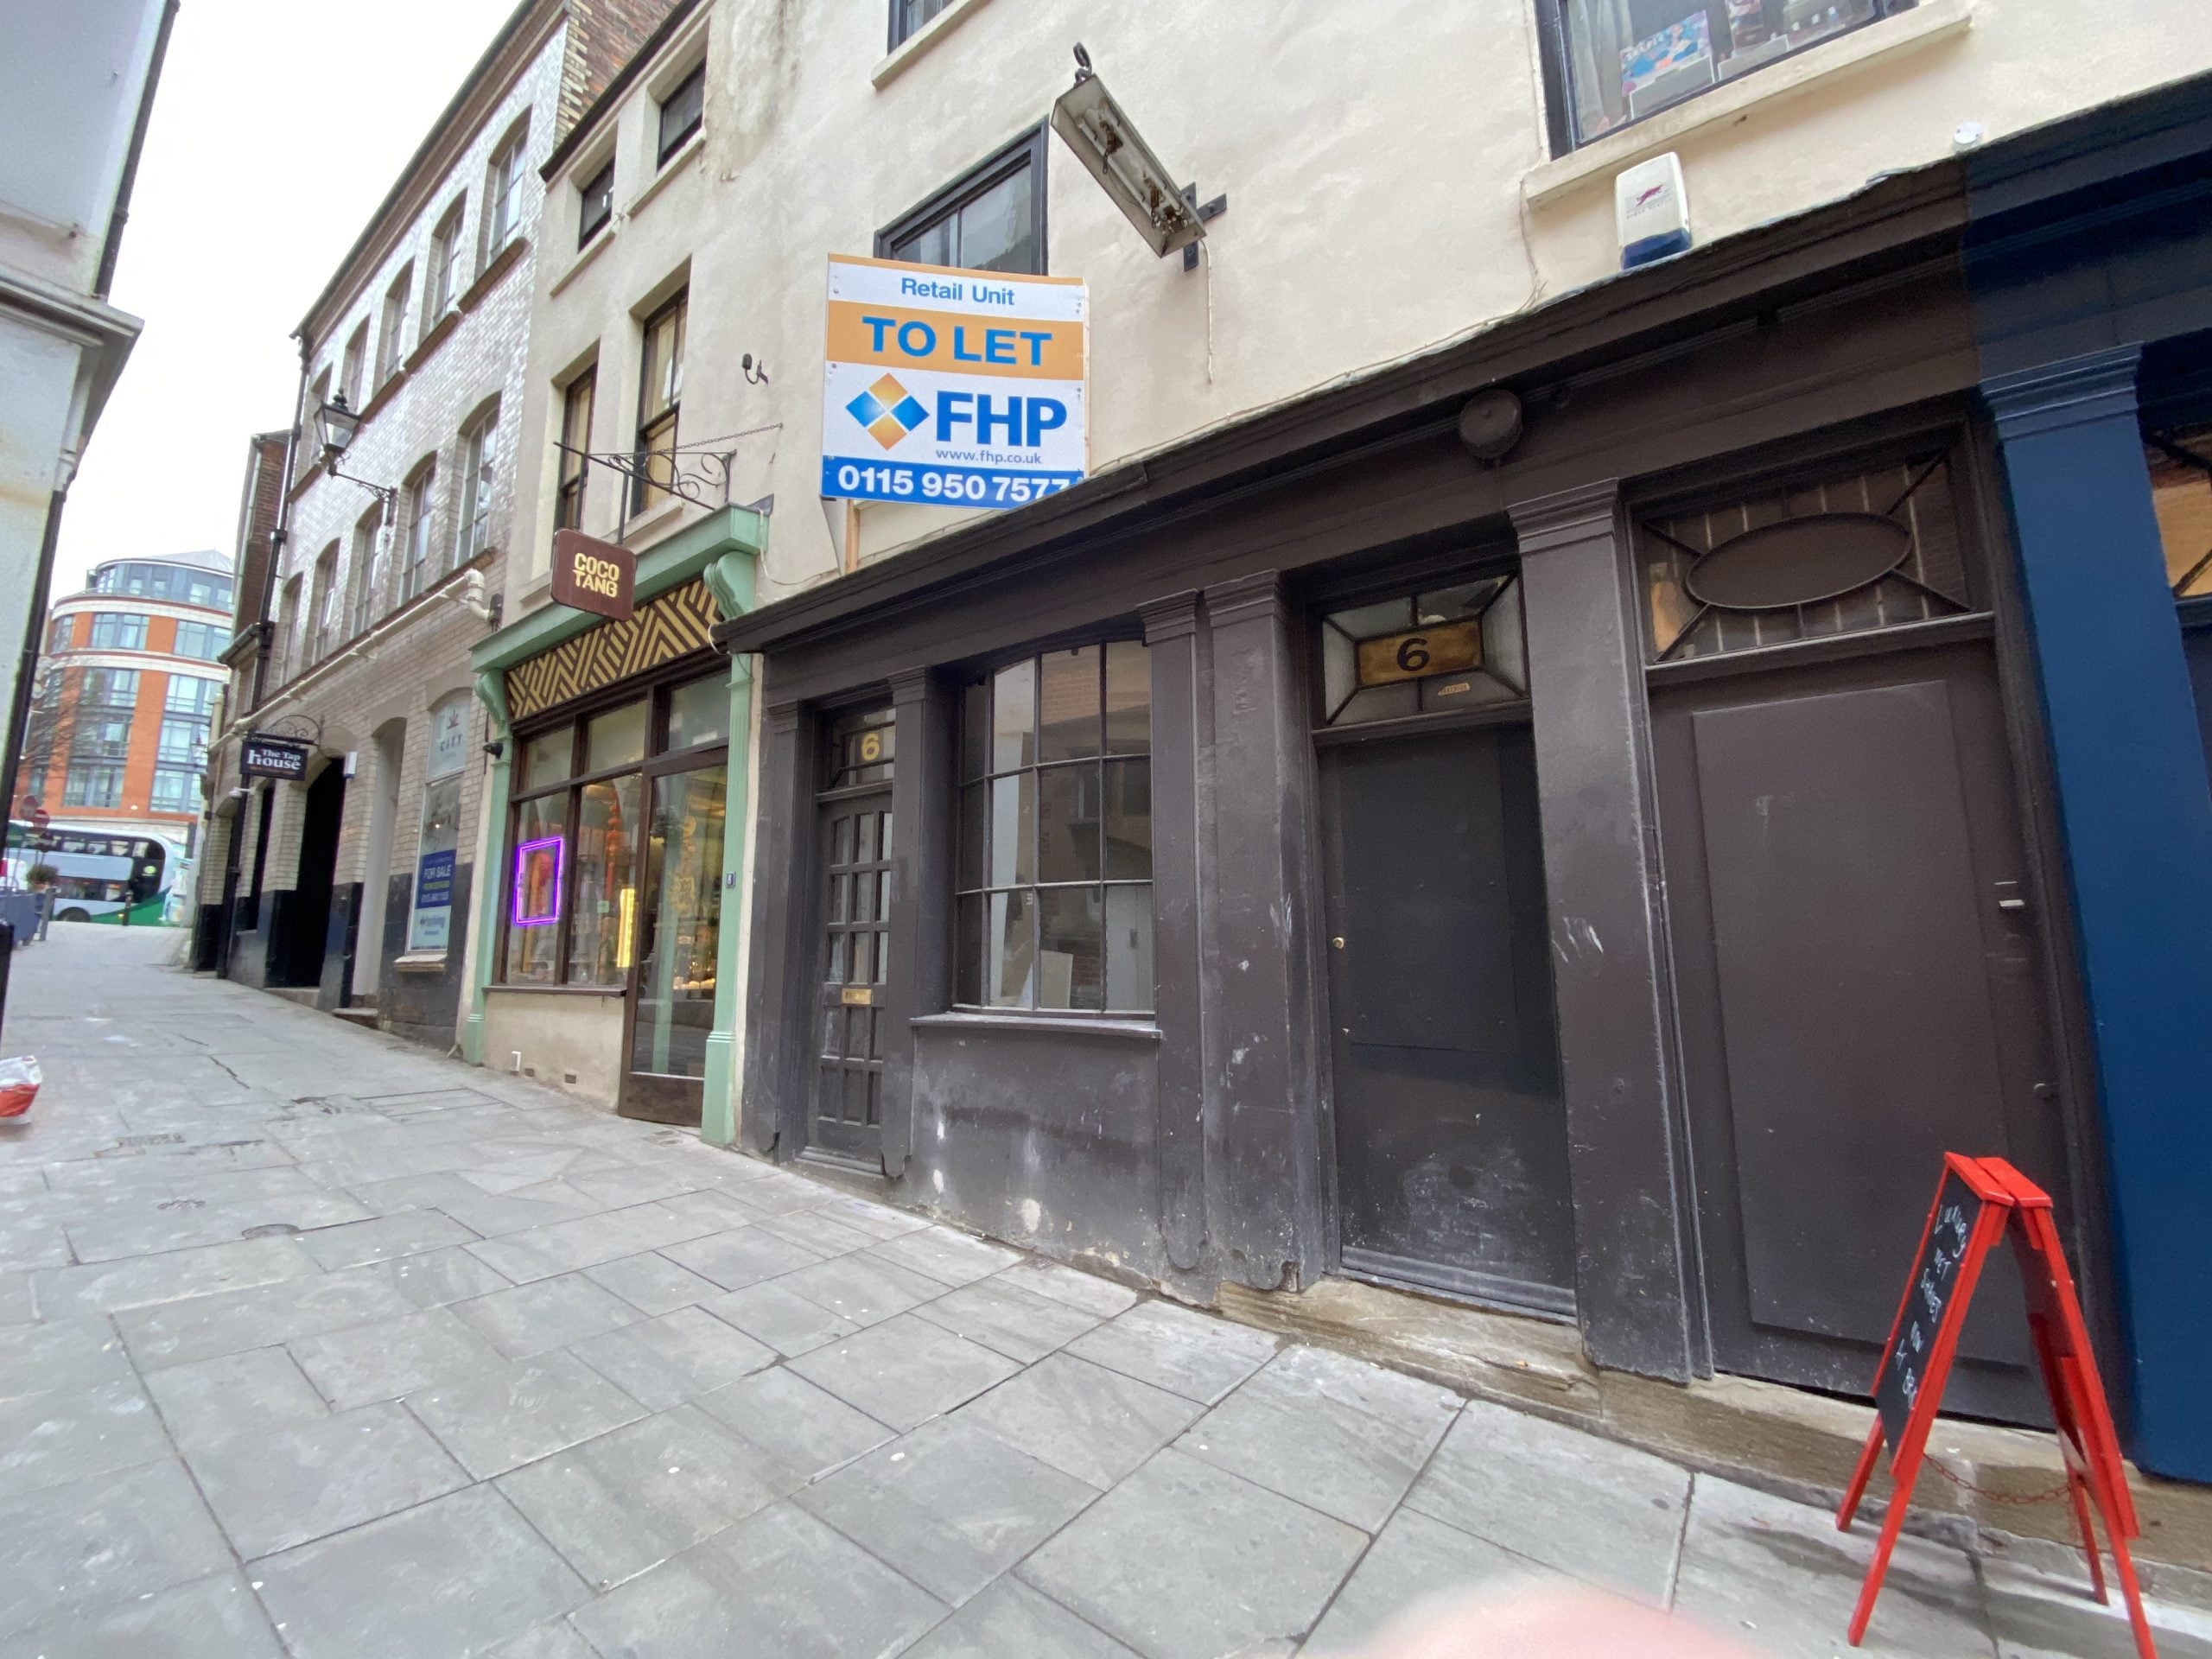 Nottingham city empty businesses